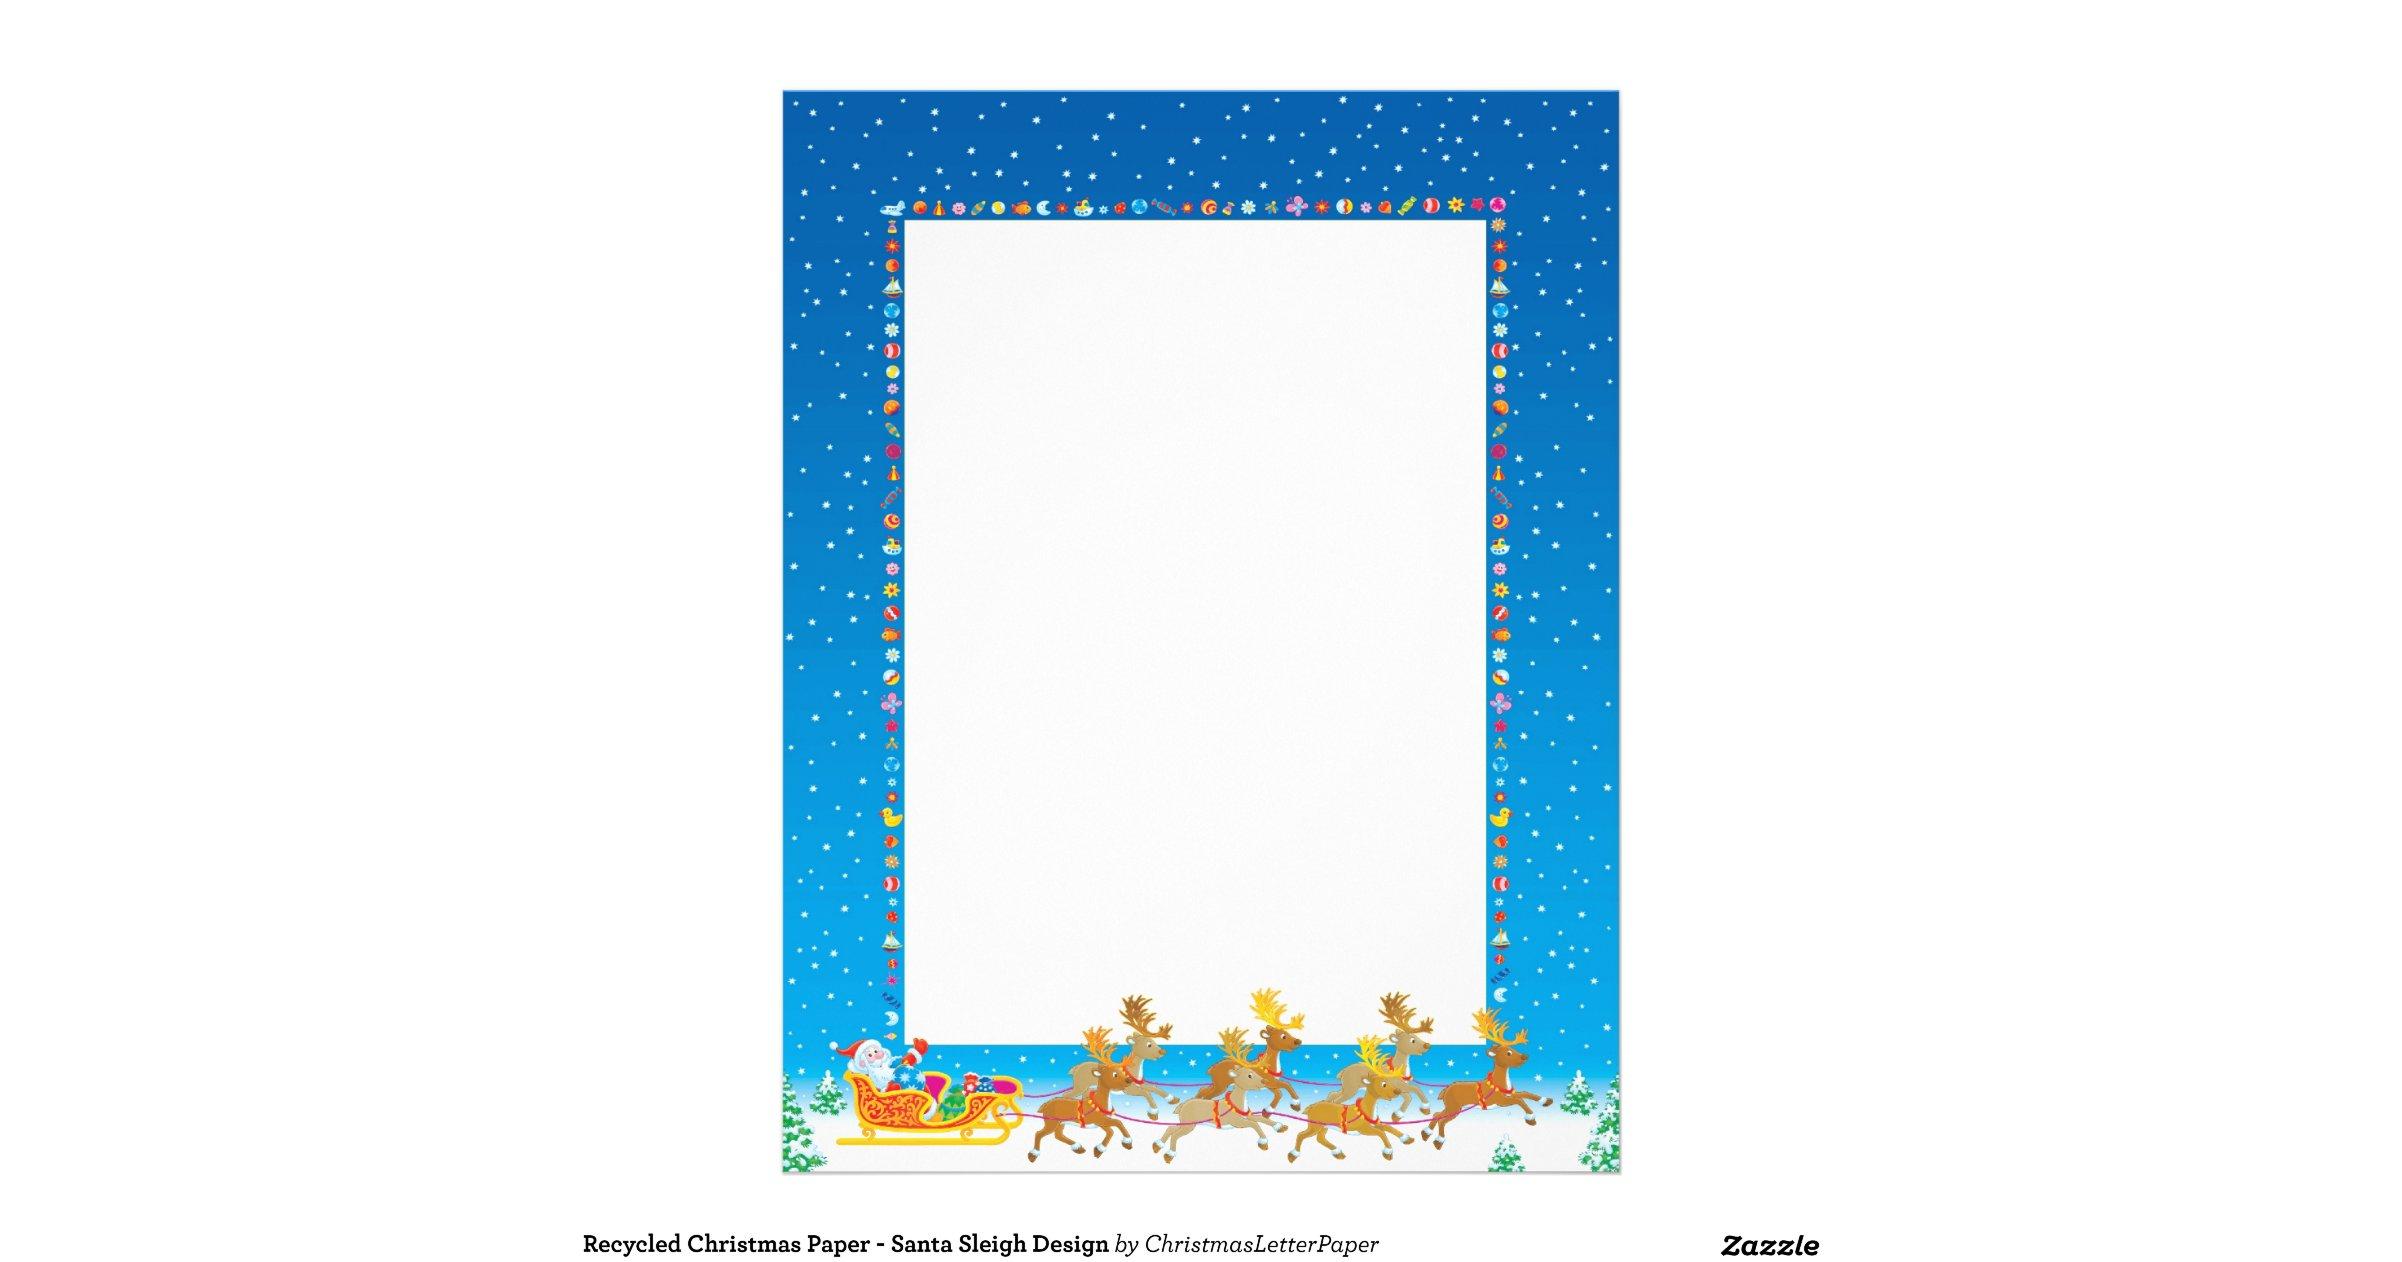 recycled_christmas_paper_santa_sleigh_design_letterhead-r092842e69c5f4435a0dacf9e8ef32da5_vg6ra ...